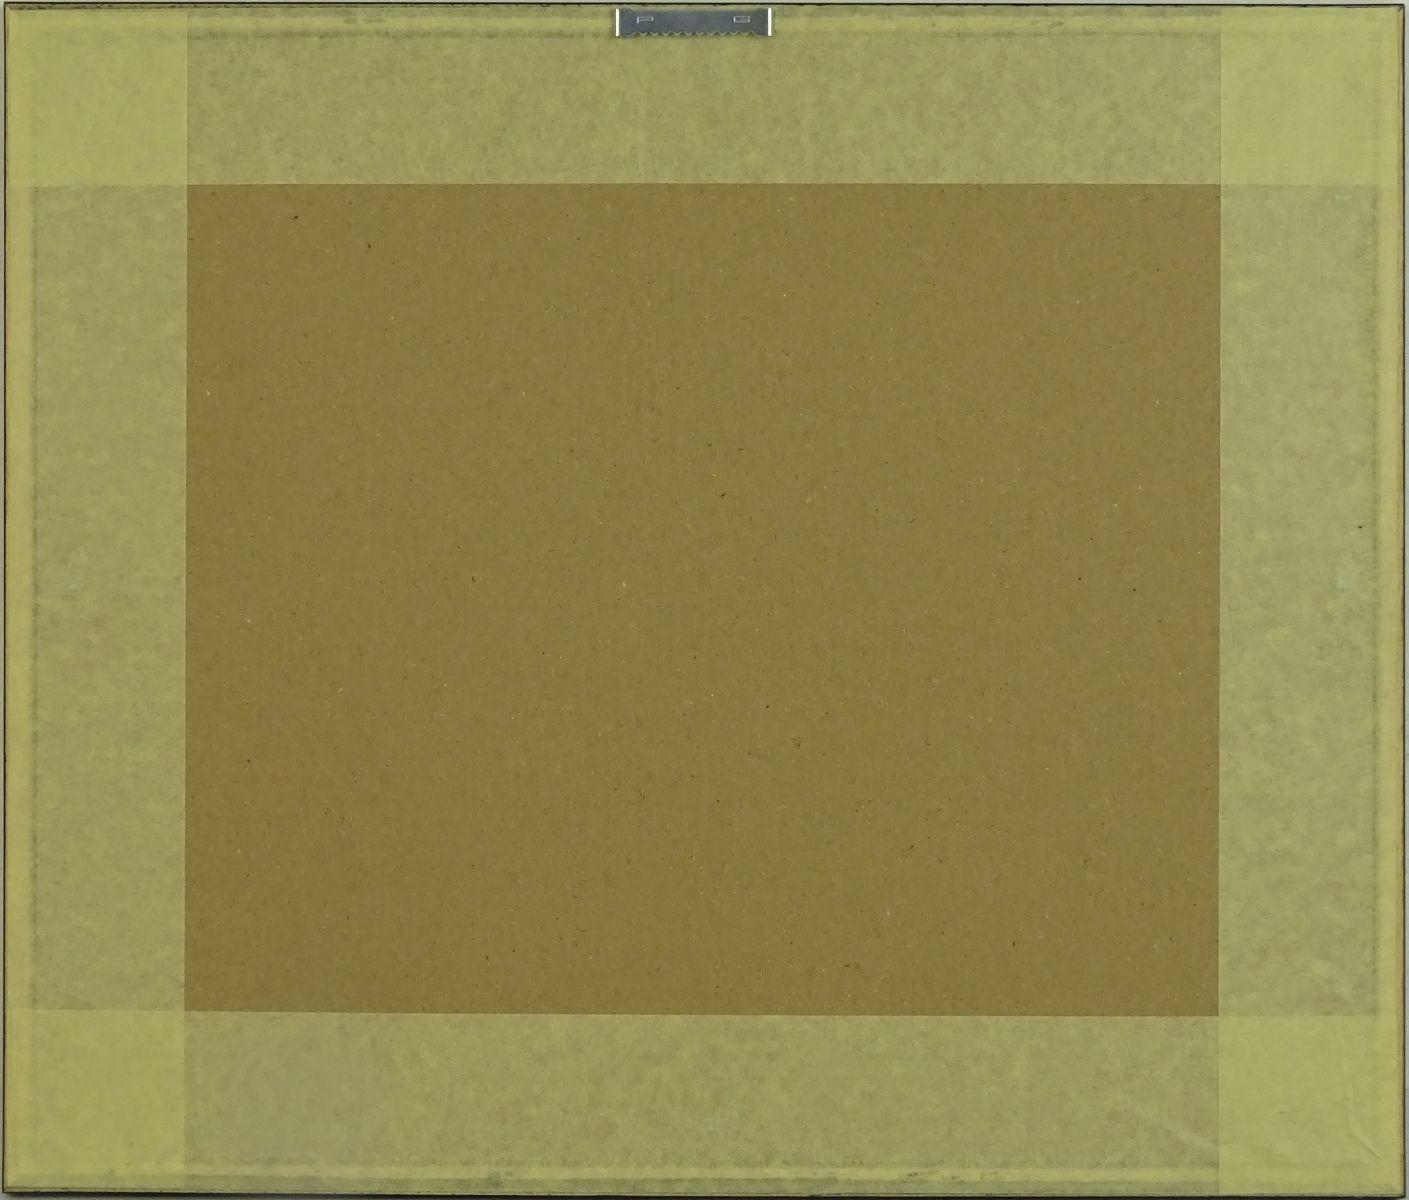 DSC05137.JPG (1409×1200)